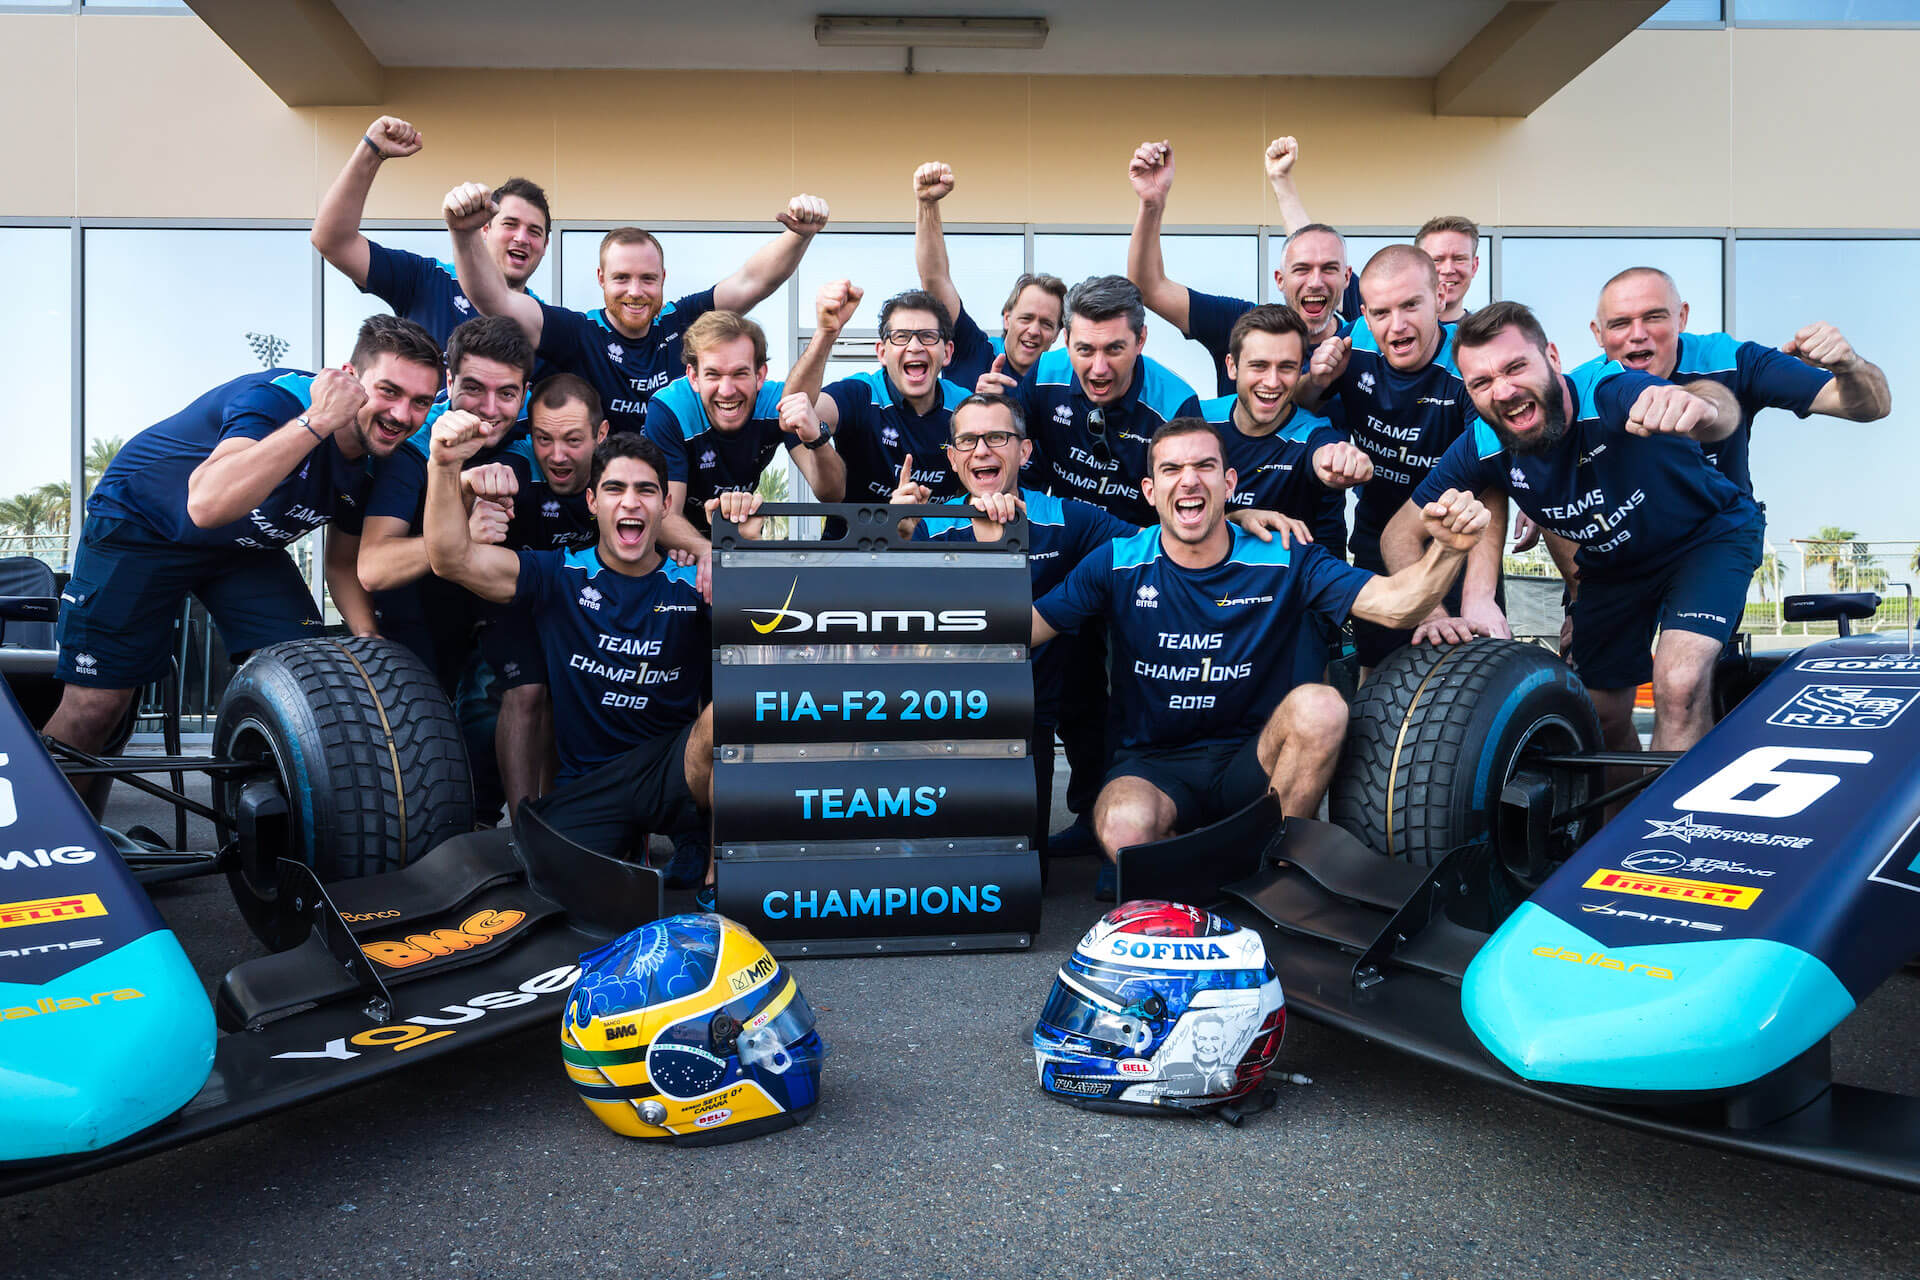 DAMS celebrates winning the 2019 F2 teams' title